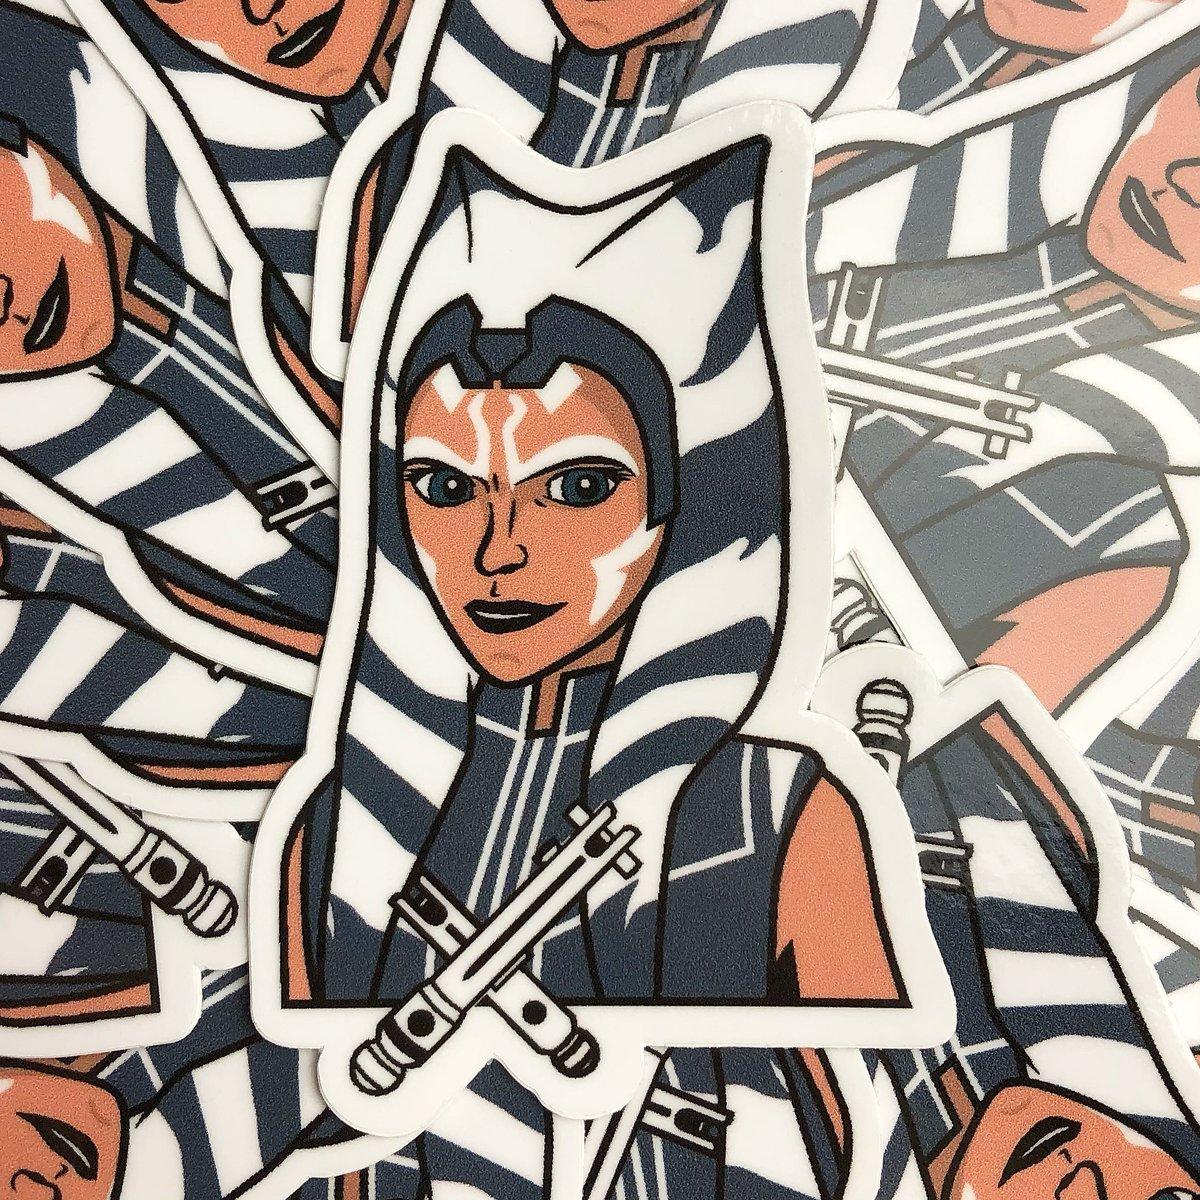 Image of 'Clone Wars Ahsoka' Sticker